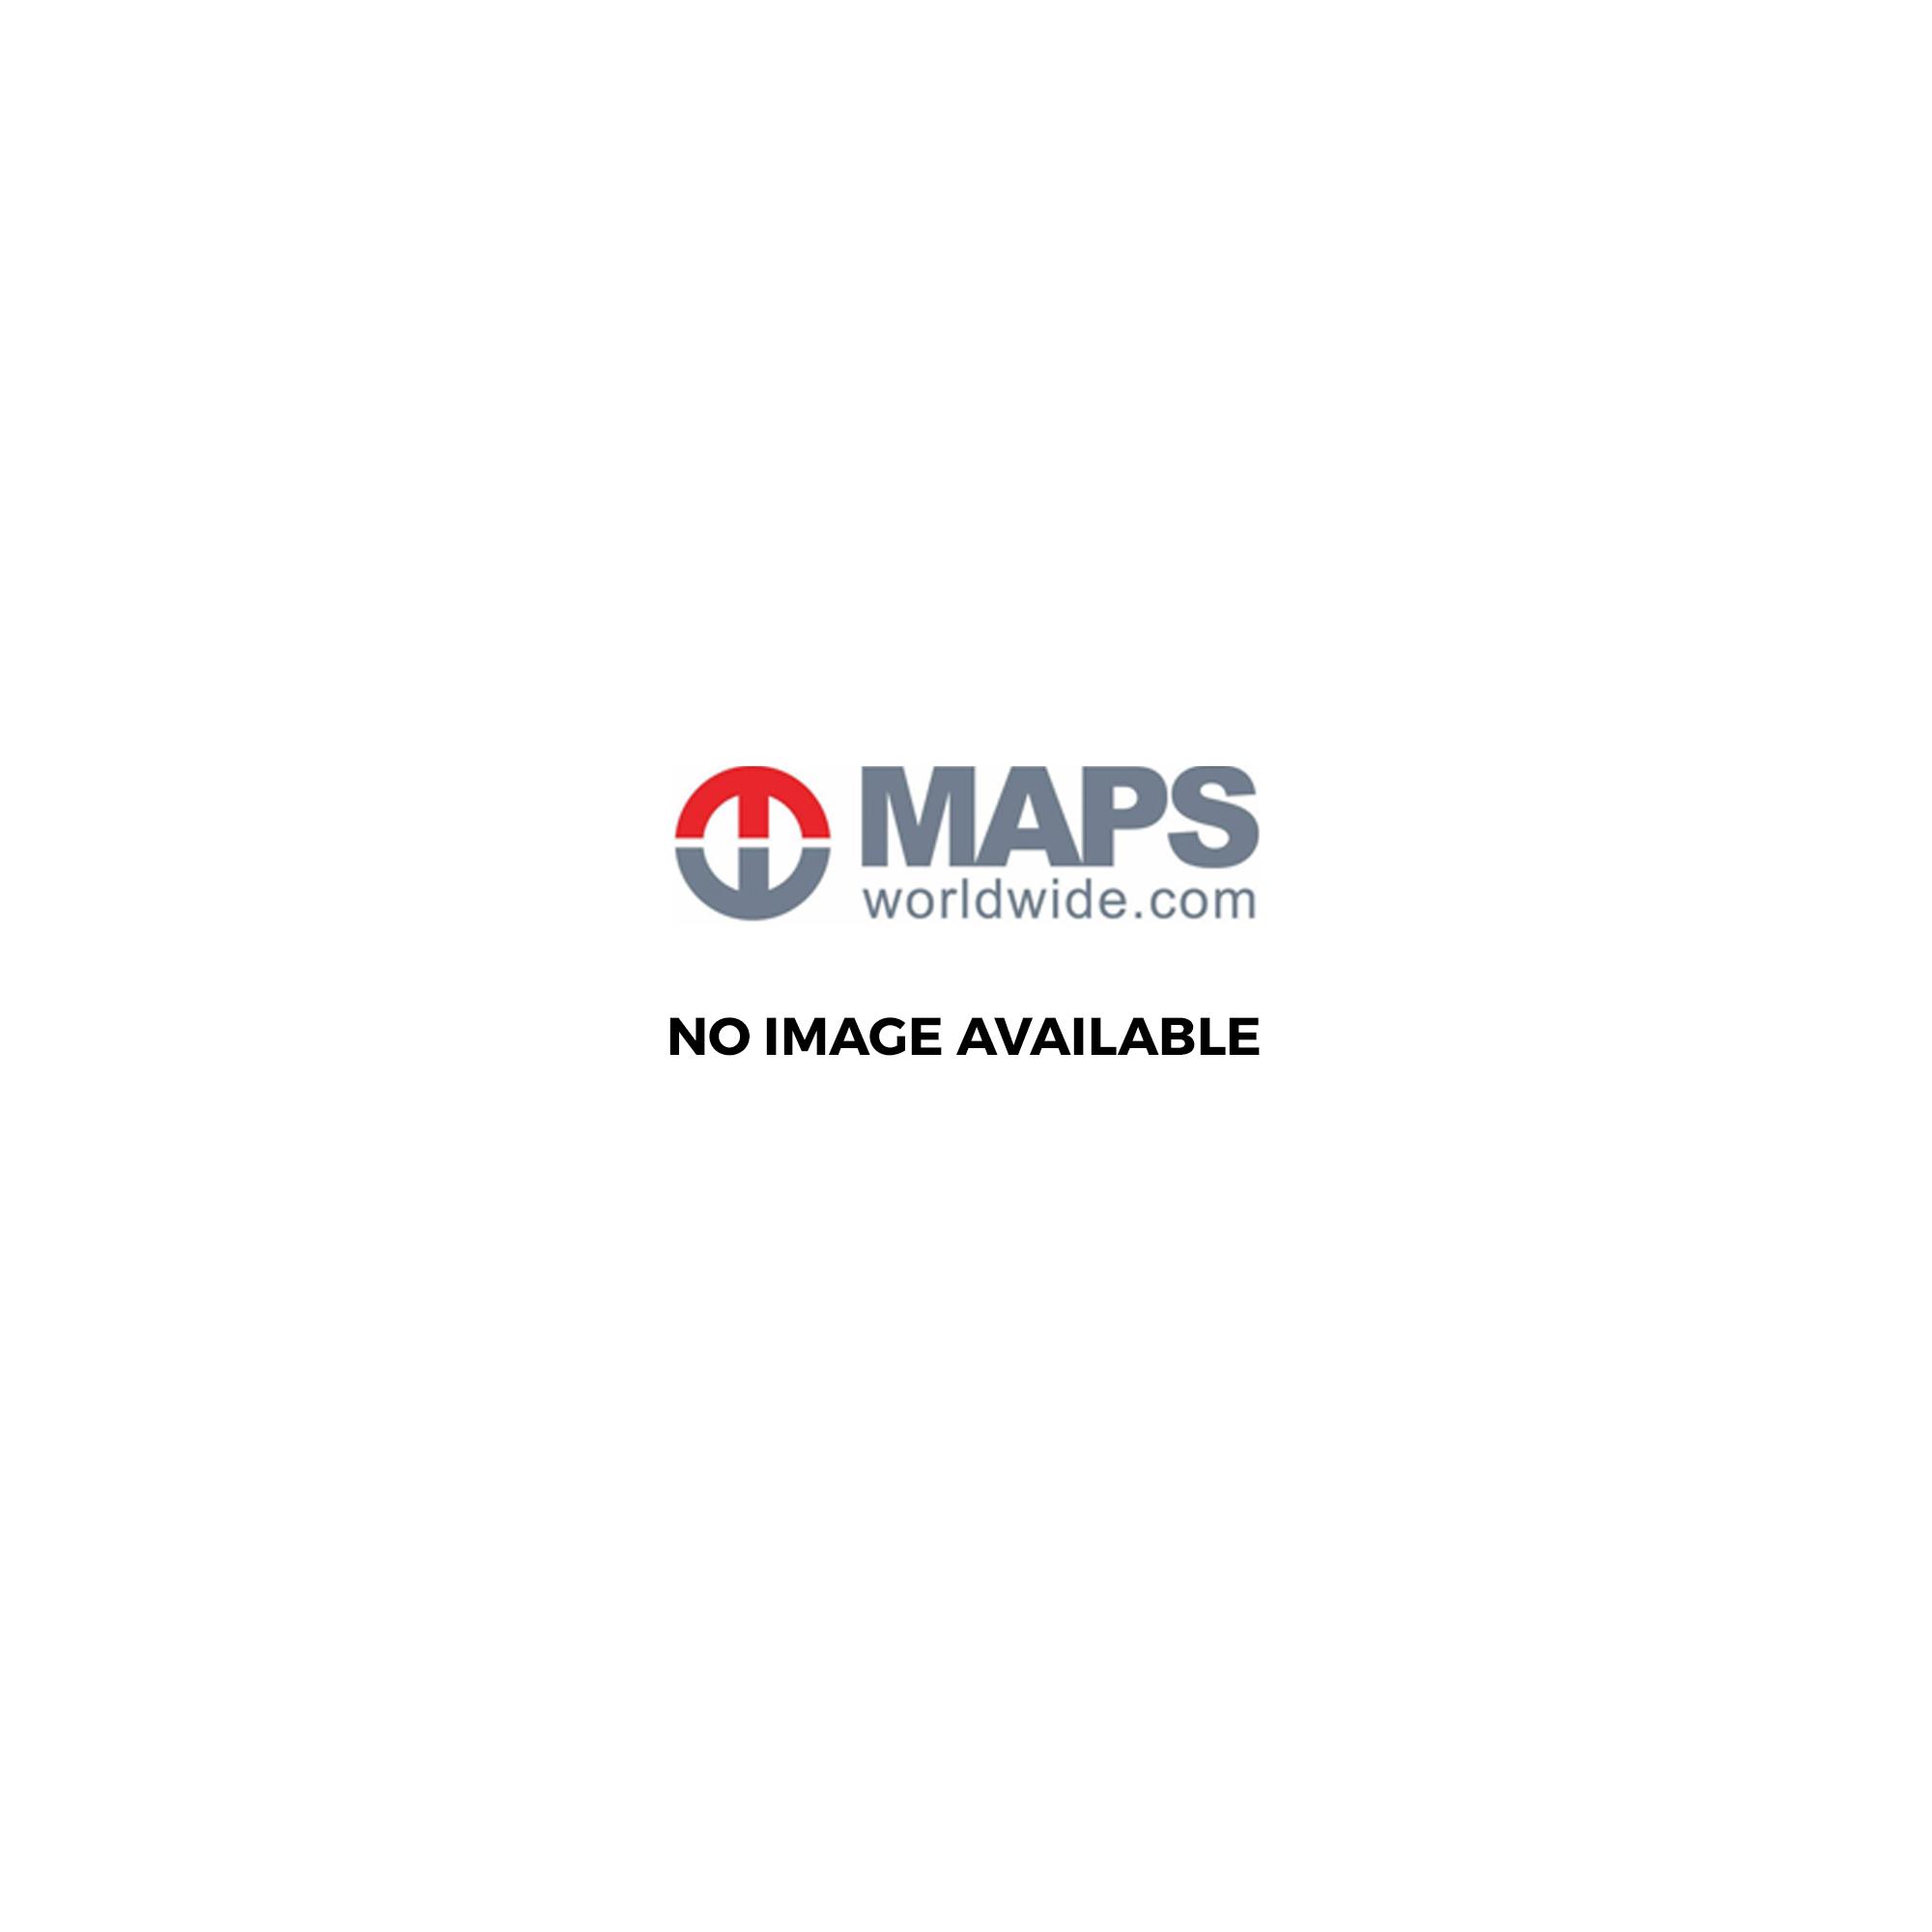 Michelin US Zoom Map 171: Pacific Northwest - Washington Oregon